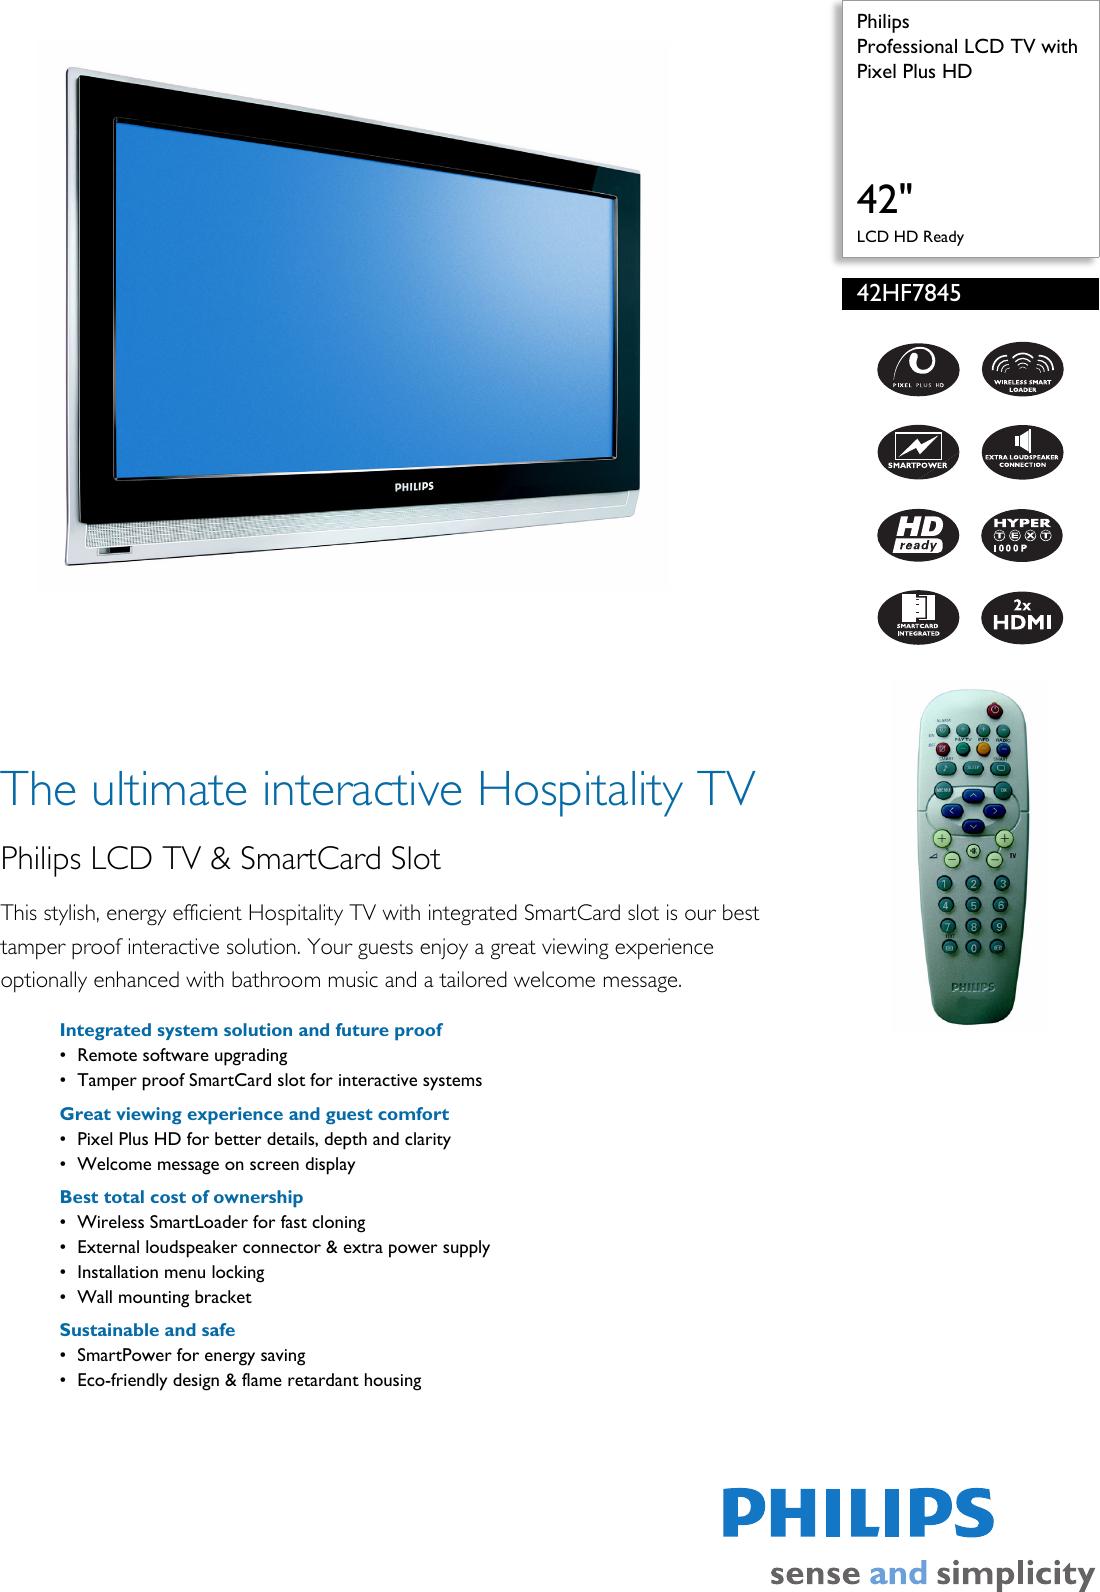 Philips 42Hf7845 Users Manual 42HF7845/10 Professional LCD